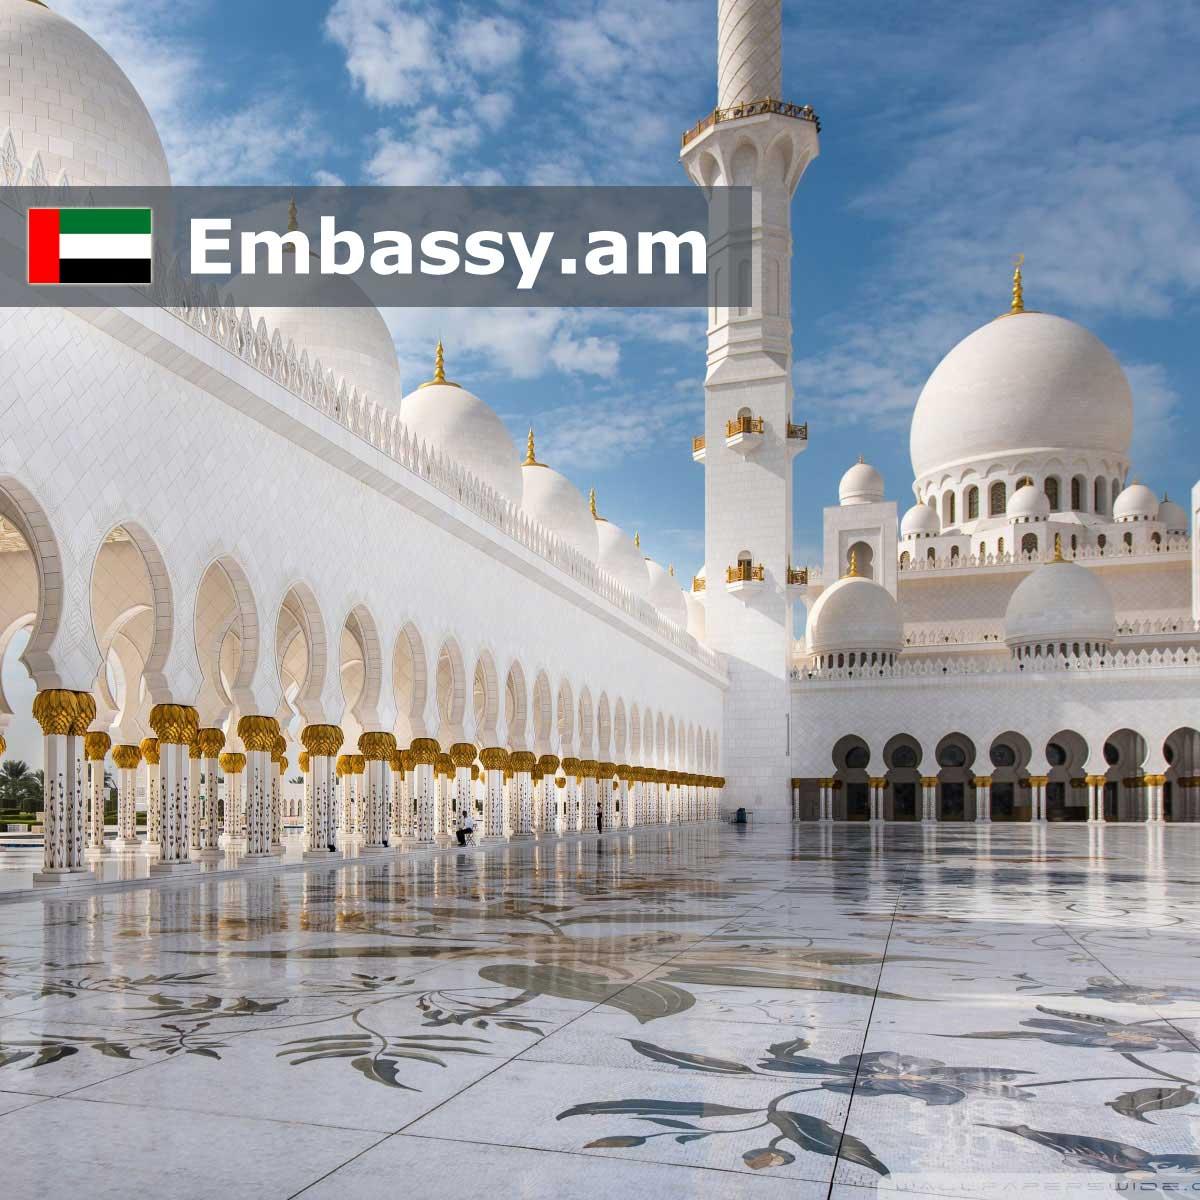 Abu Dhabi - Hotels in the United Arab Emirates - Embassy.am